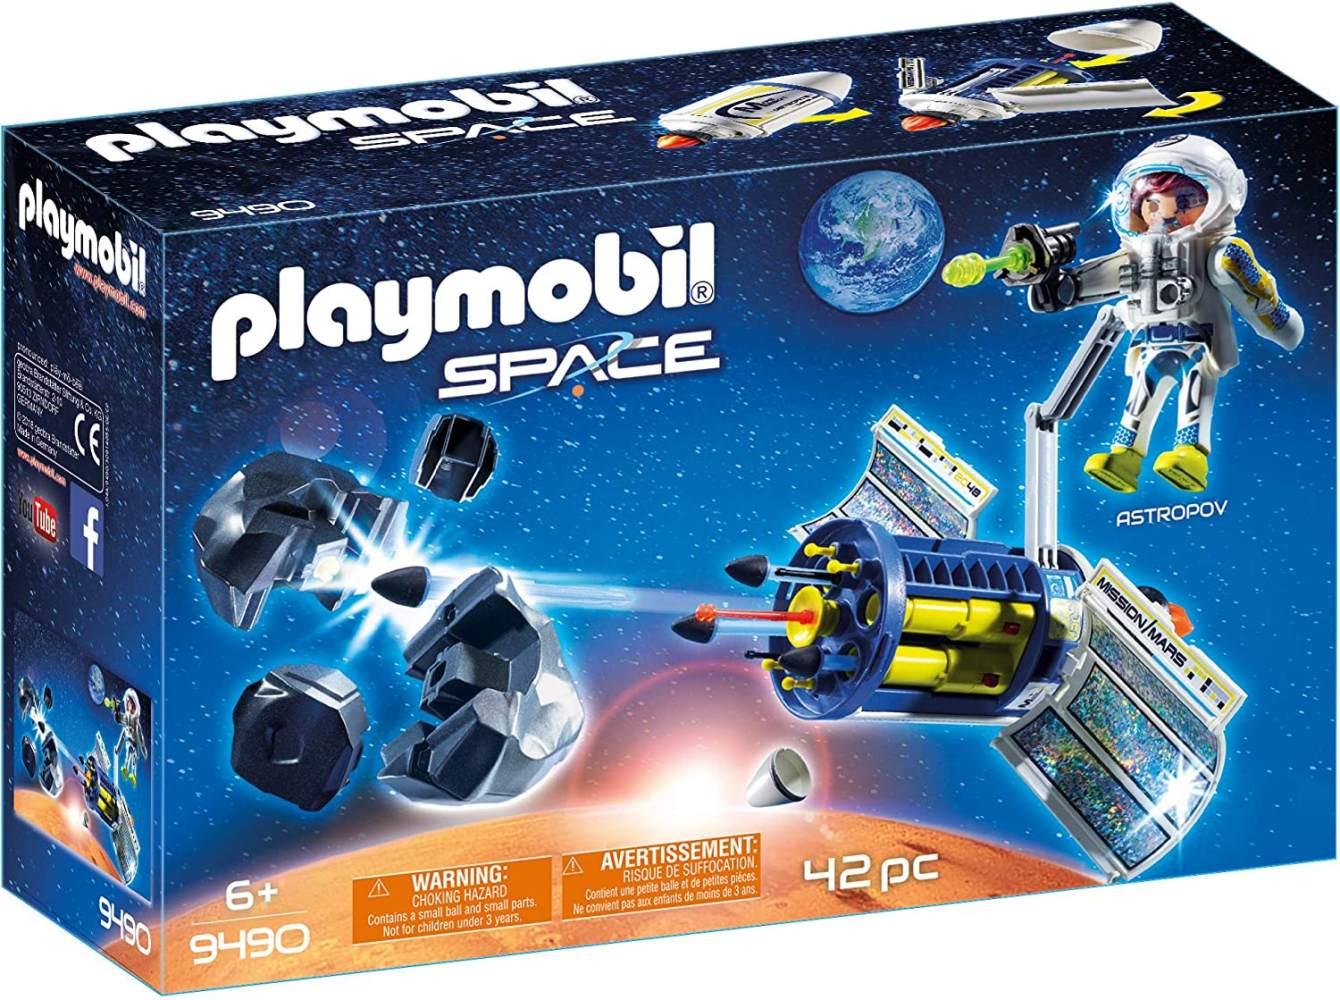 Playmobil 9490 Spielzeug-Meteoroiden-Zerstörer Bild 1